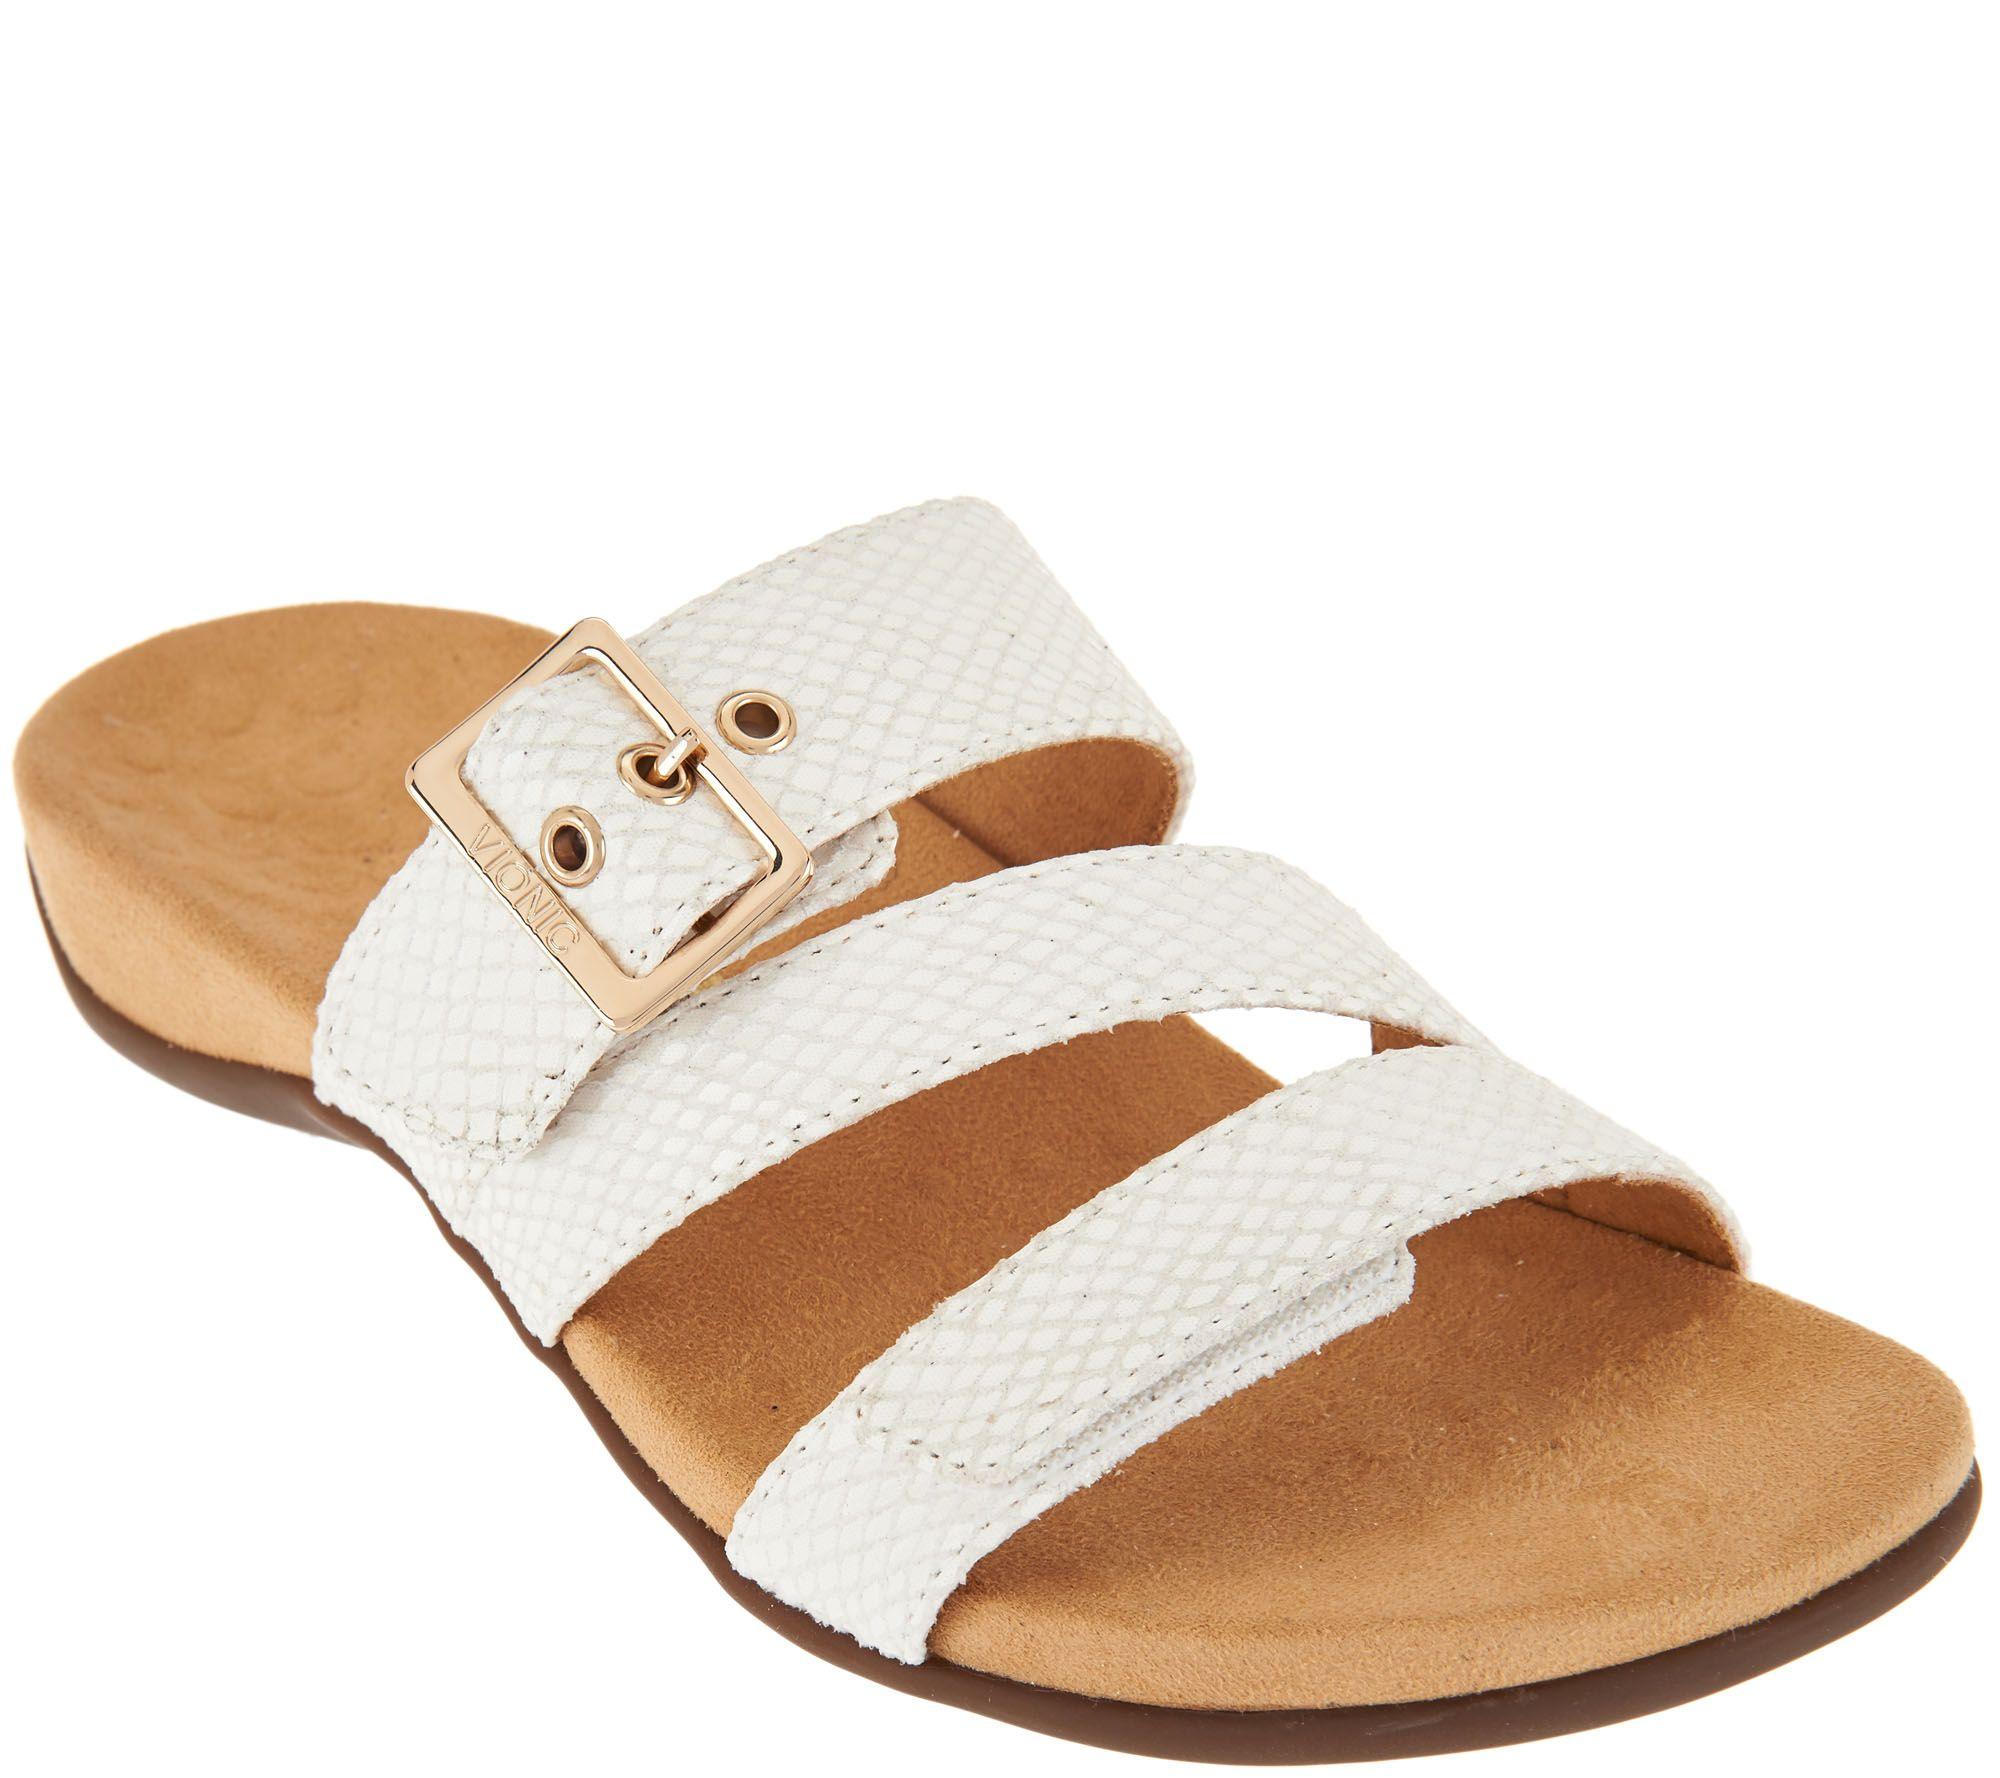 6eca5f8e886c Vionic Adjustable Slide Sandals - Skylar - Page 1 — qvc vionic shoes video